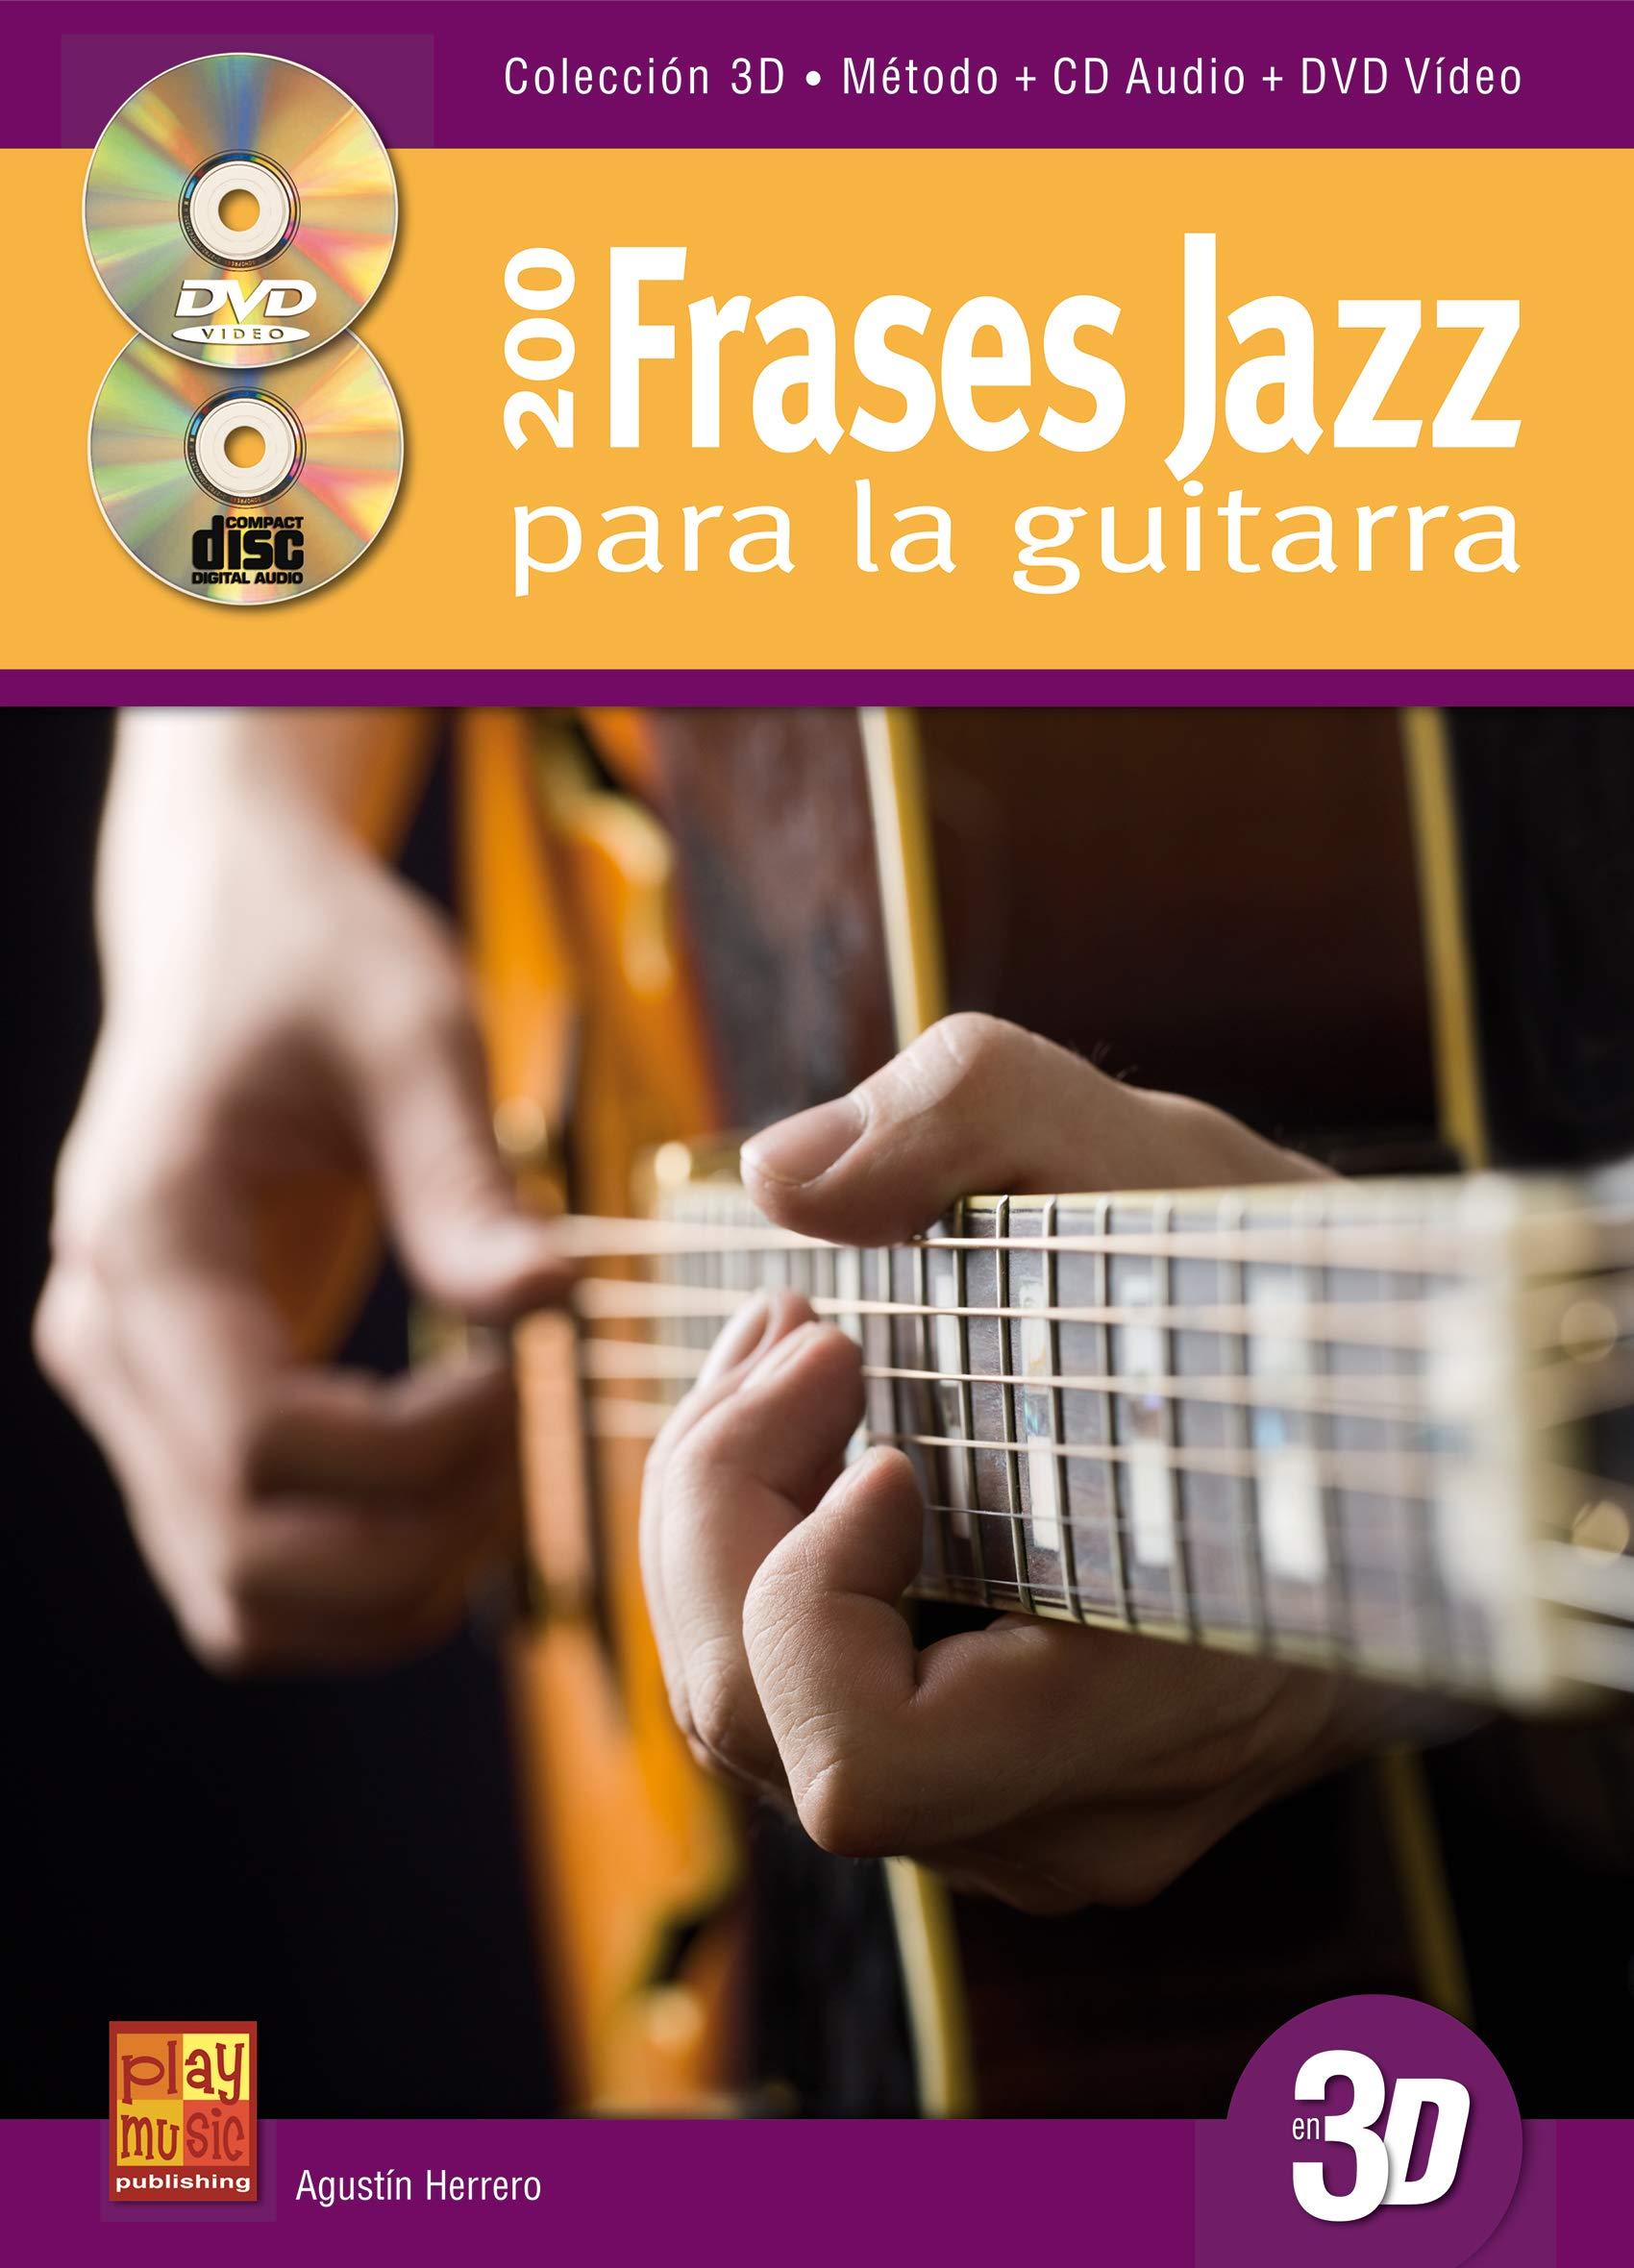 200 frases jazz para la guitarra en 3D - 1 Libro + 1 CD + 1 DVD ...